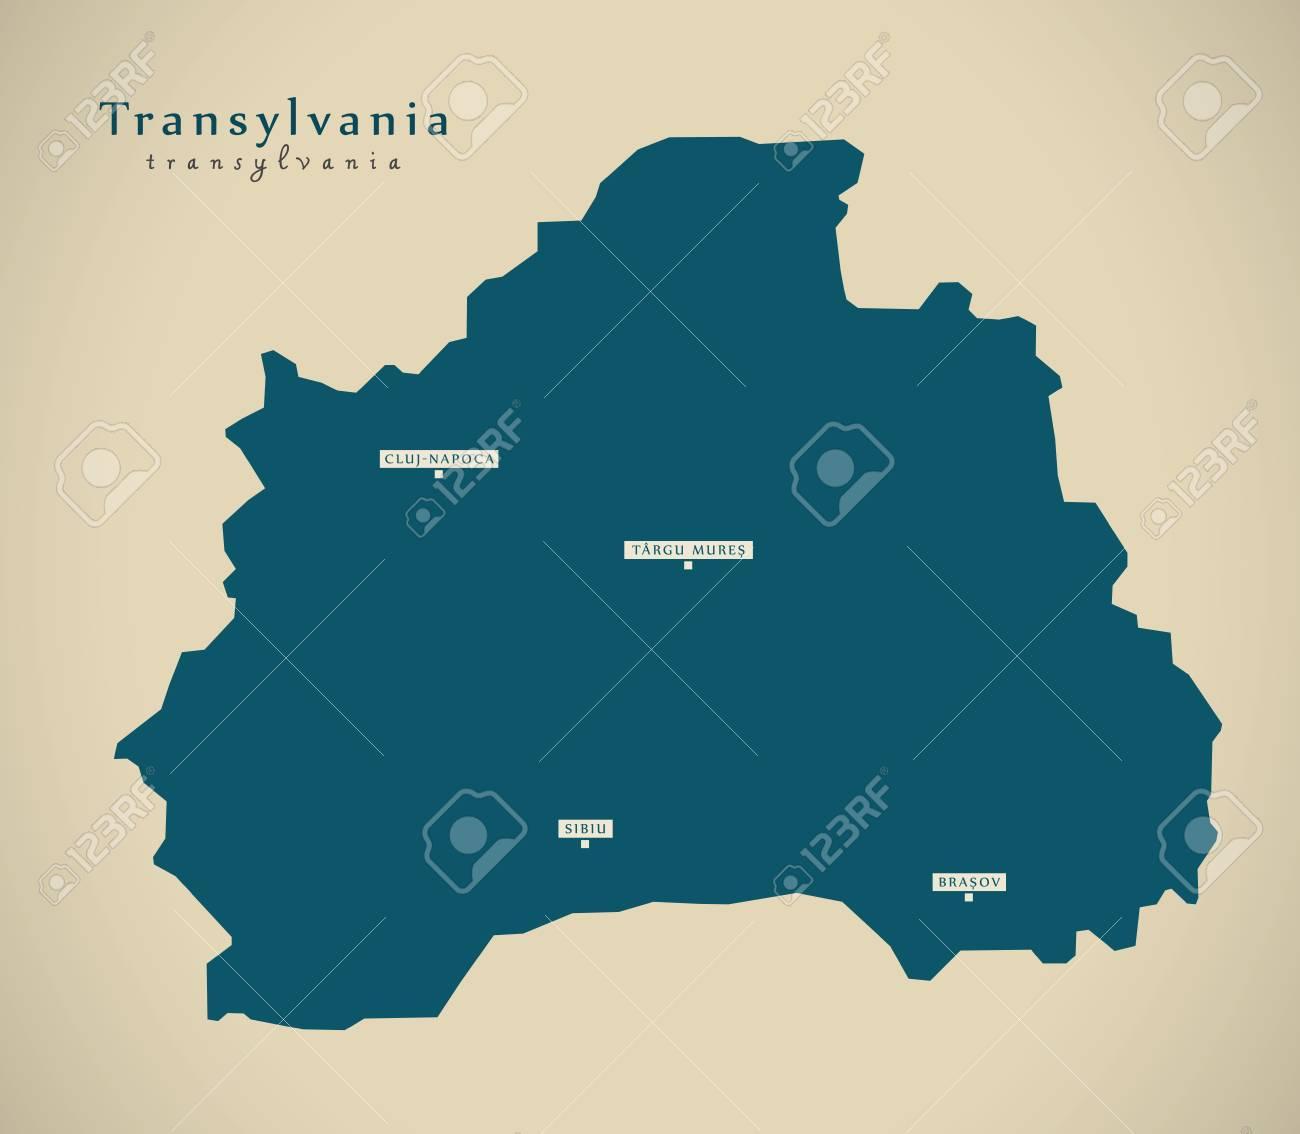 Perfect Illustration   Modern Map   Transylvania Romania RO Illustration